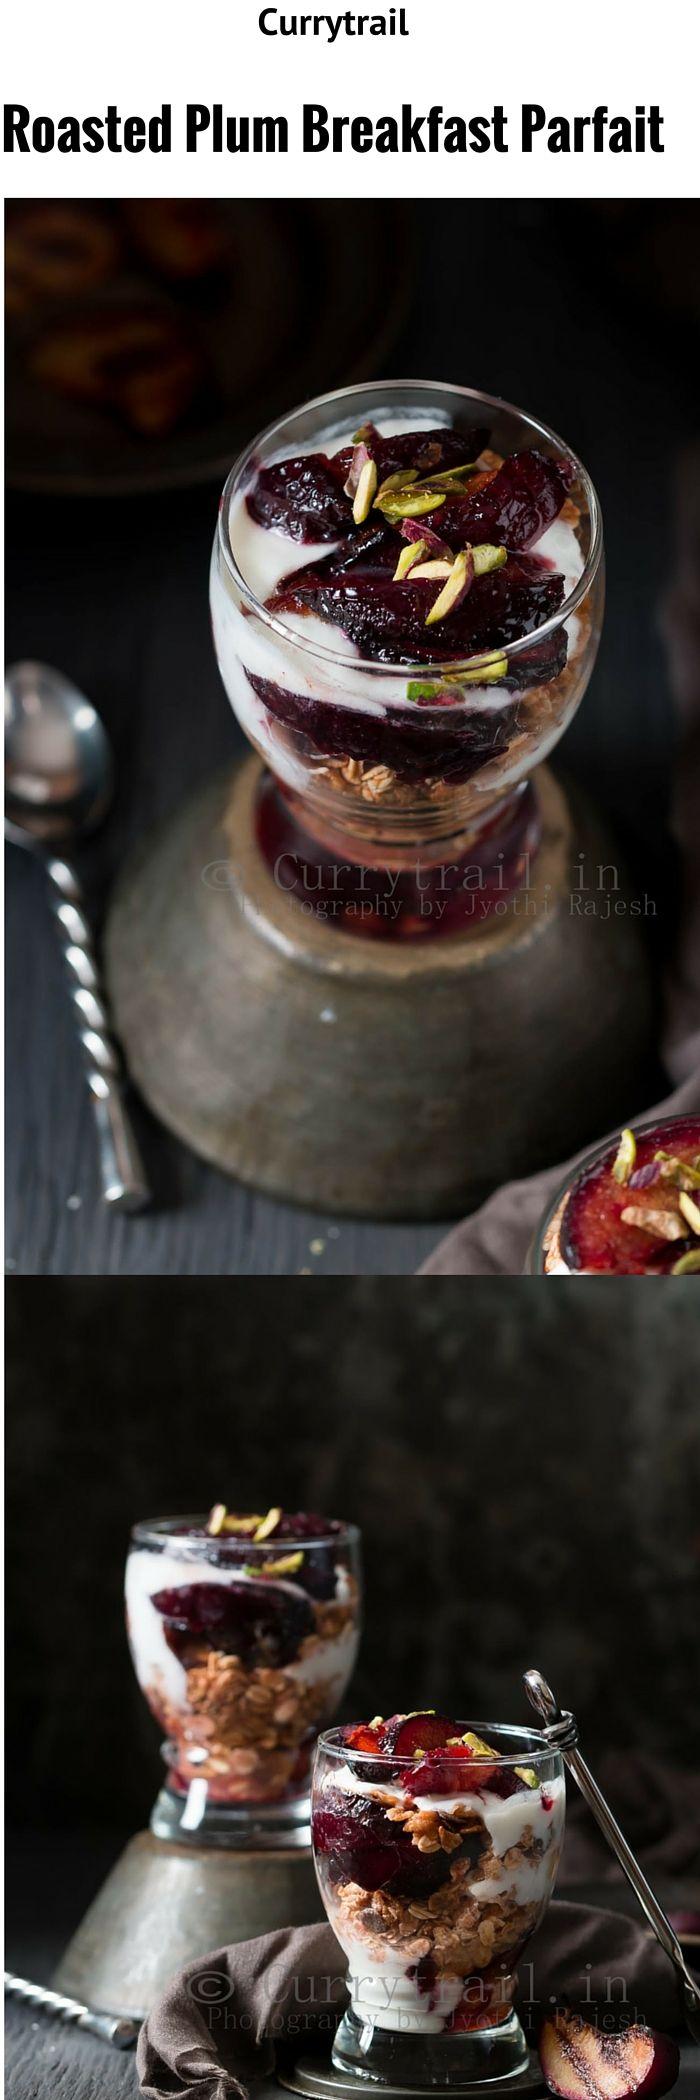 Roasted Plum Breakfast Parfait